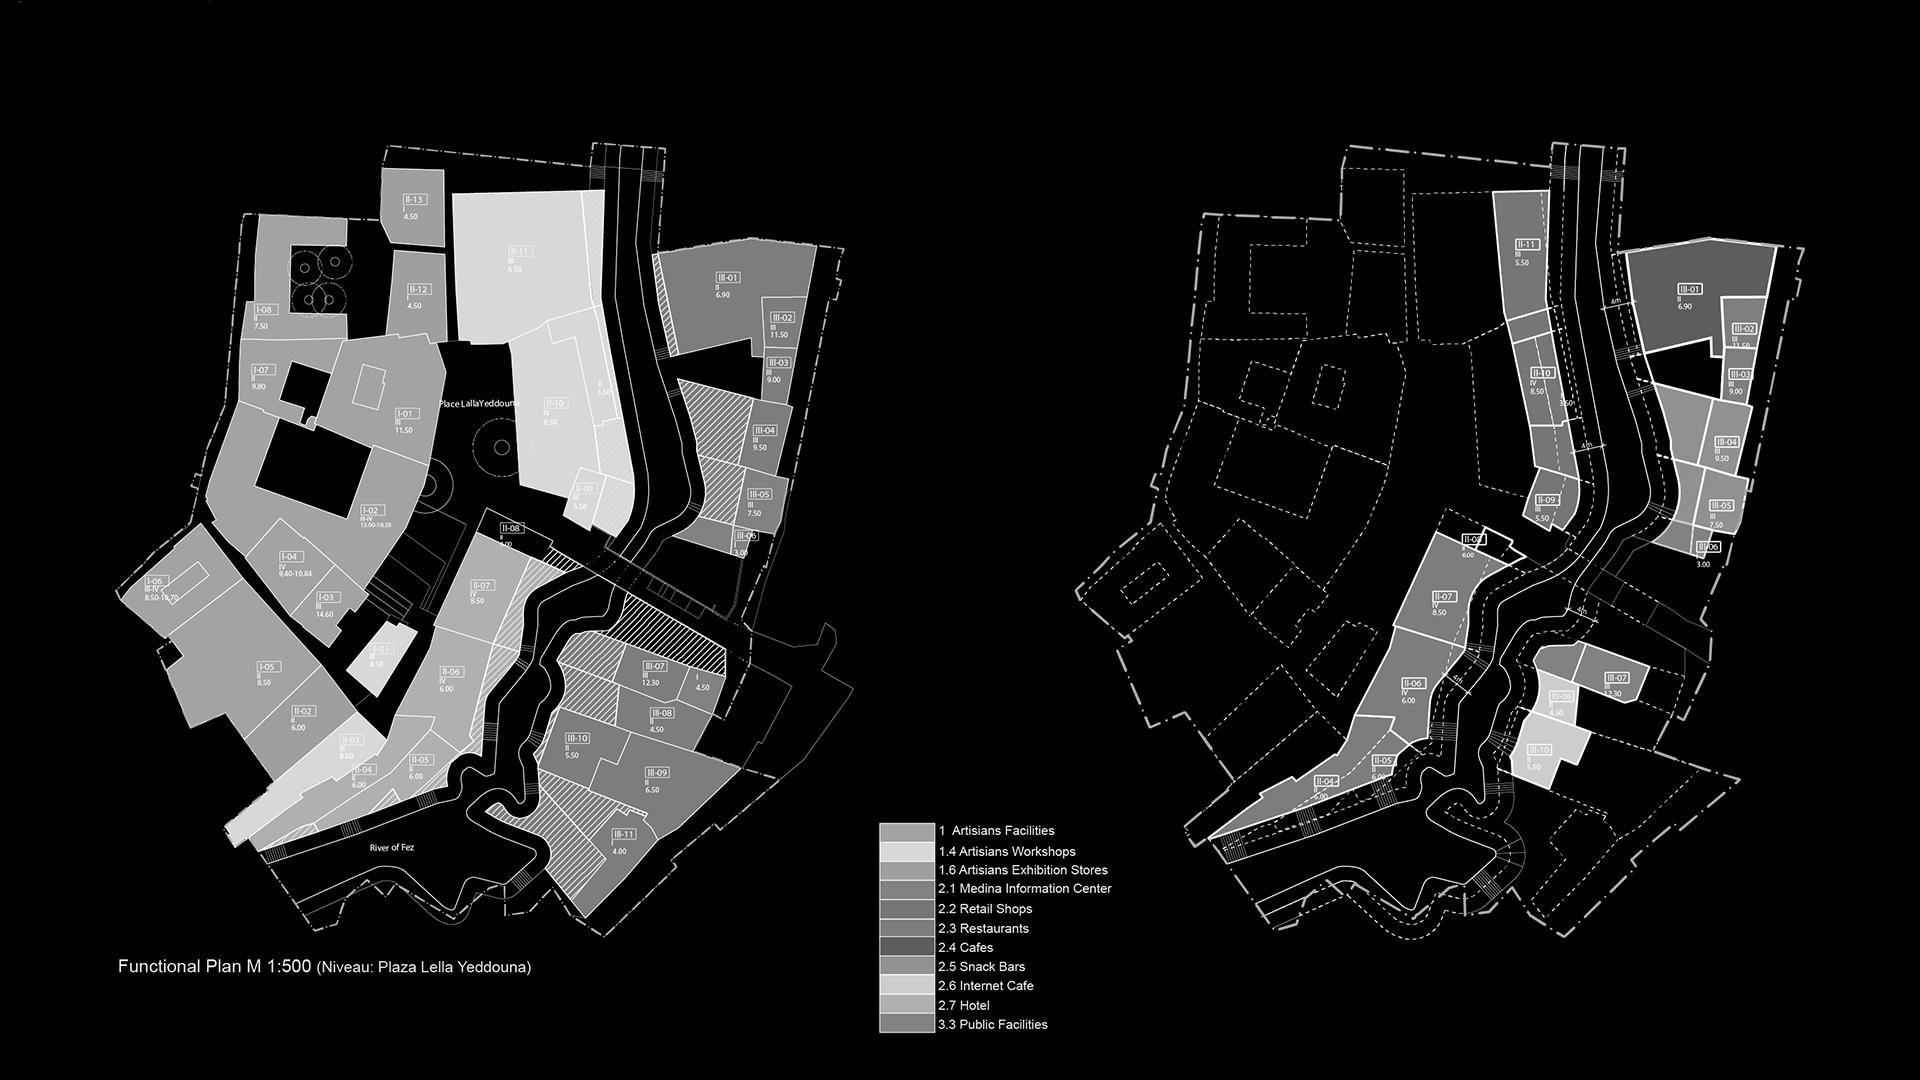 place-lalla-yeddouna-plan2-joerg-hugo.jpg